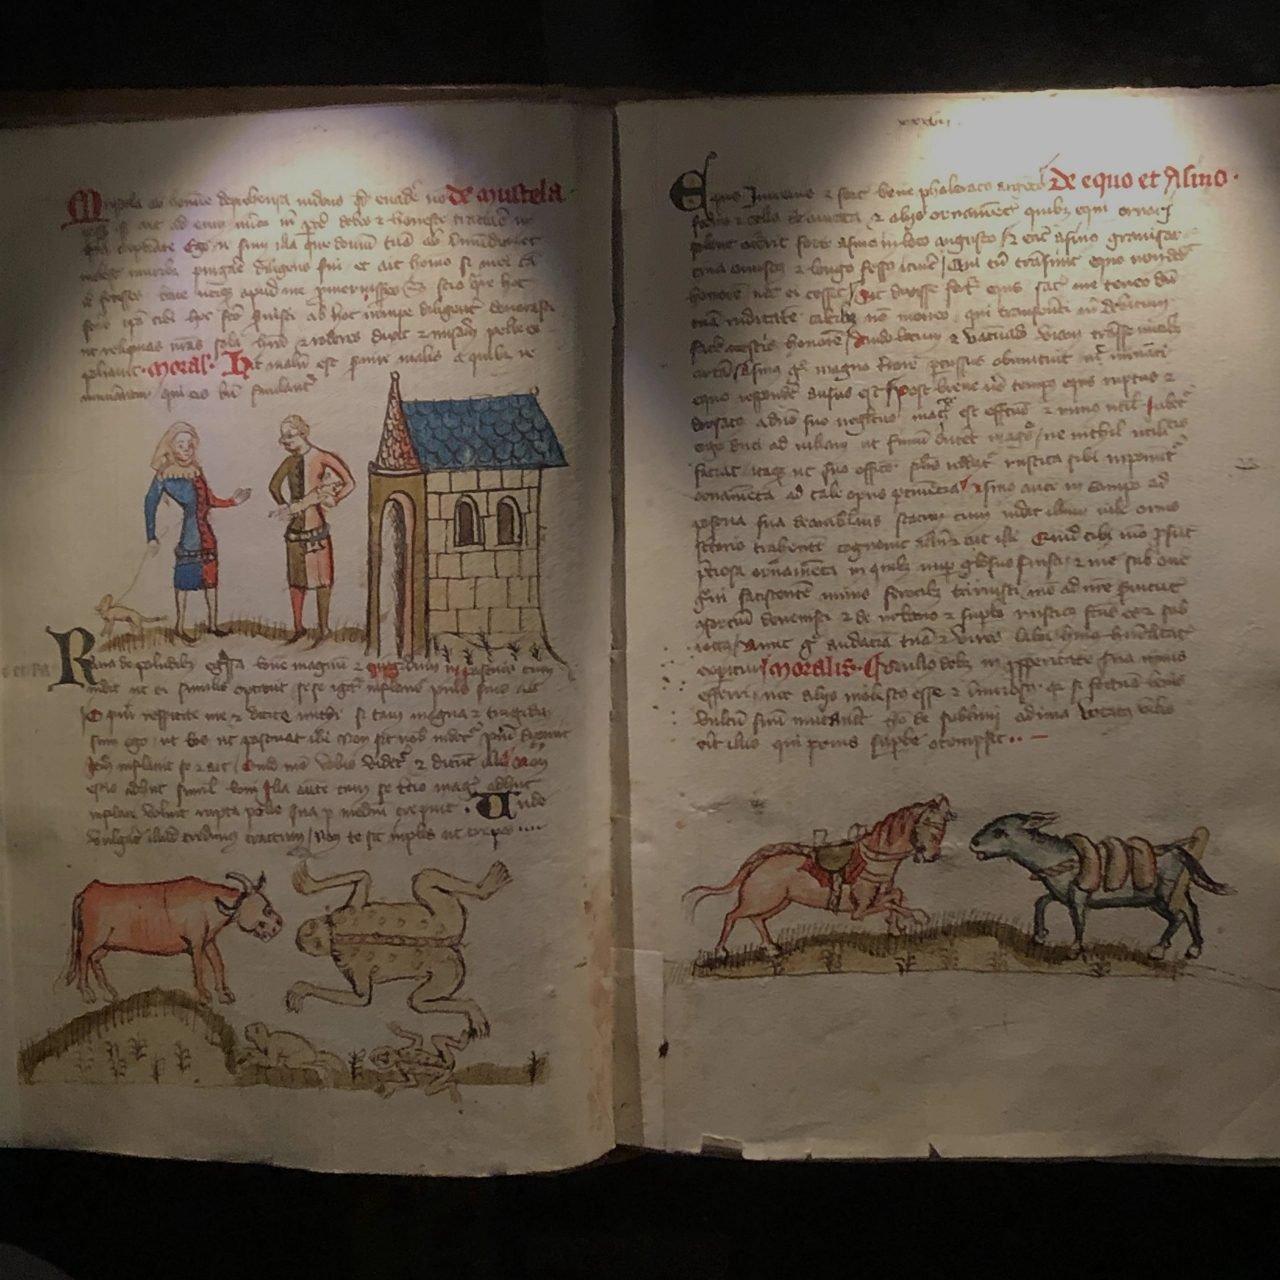 Schatzkammer Trier - Die Fabeln des Äsopund Avian - Buecherkaffee.de, Florian Valerius